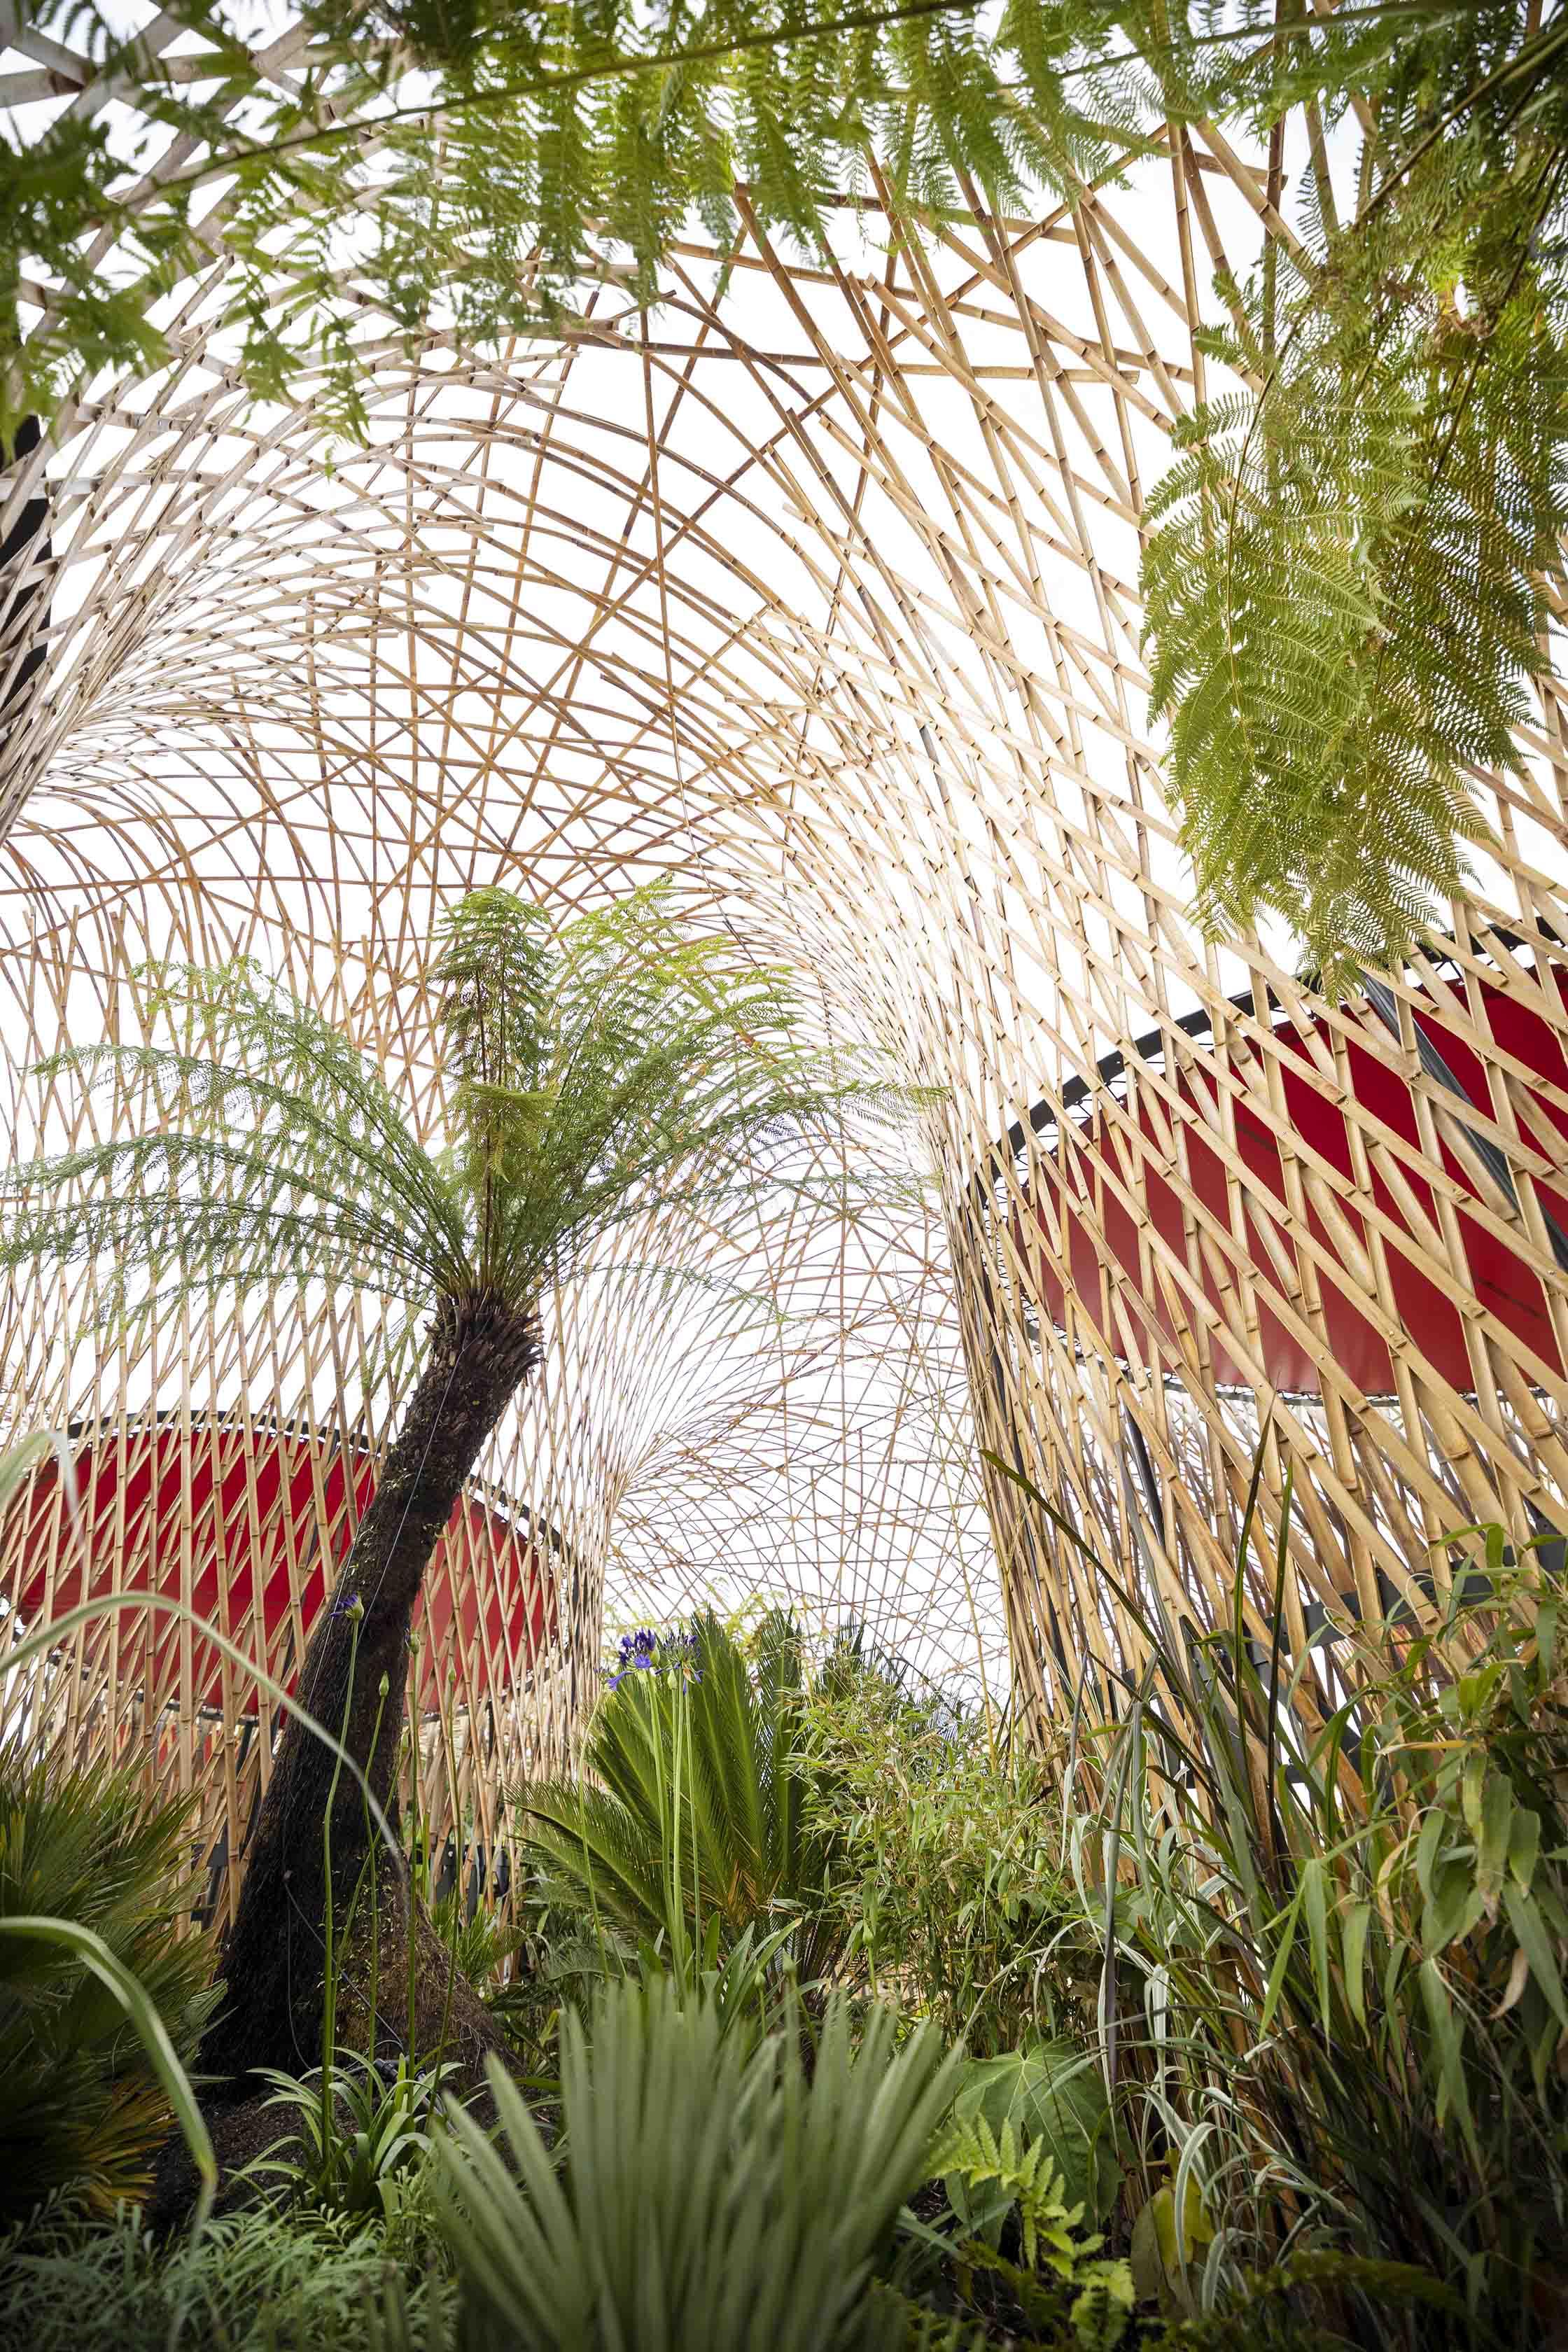 Bambusstruktur aus gespaltenem Bambusrohr Deambulons - l'Oasis - Kalice Studio - Arnaud Childeric8